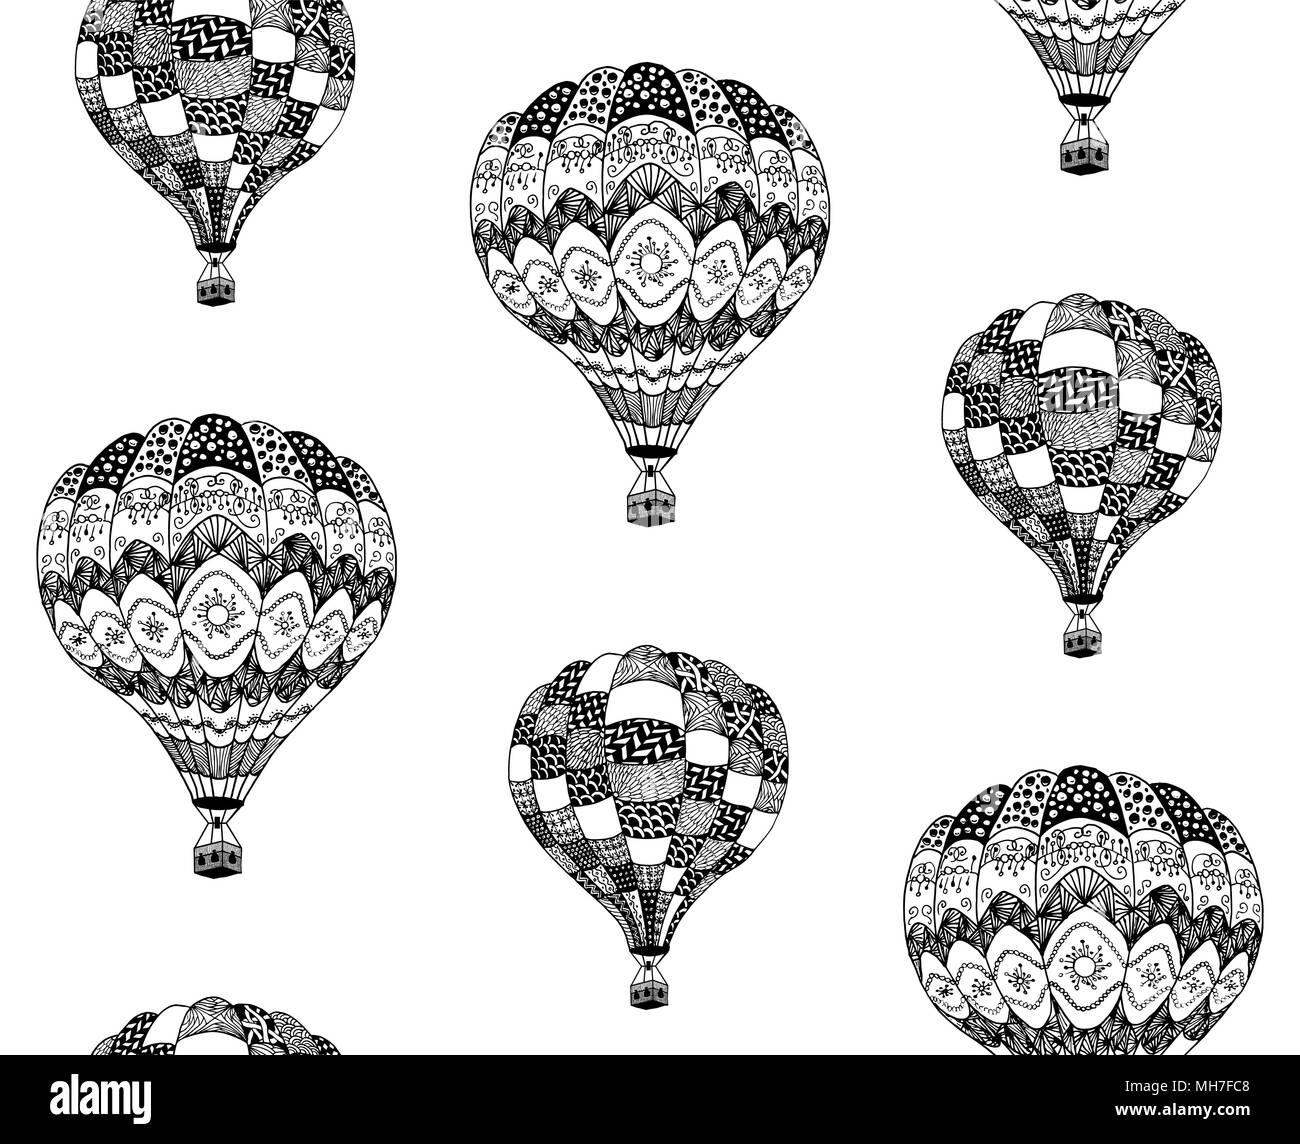 Vektor nahtlose Muster der Heißluftballon in zentangle Stil. Färbung ...